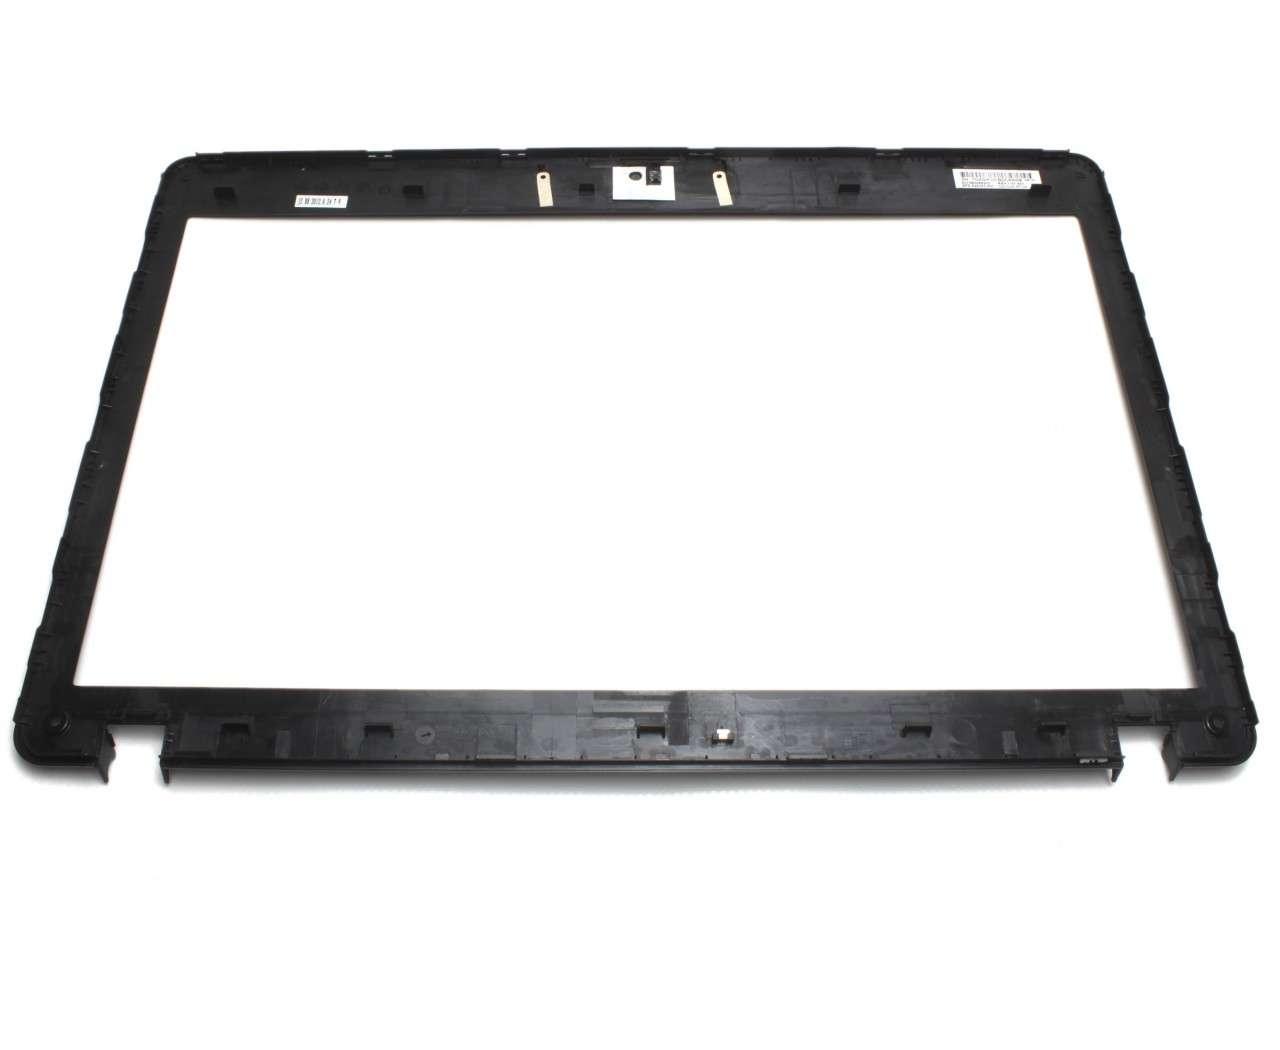 Rama Display HP 6070B0489302 Bezel Front Cover Neagra imagine powerlaptop.ro 2021